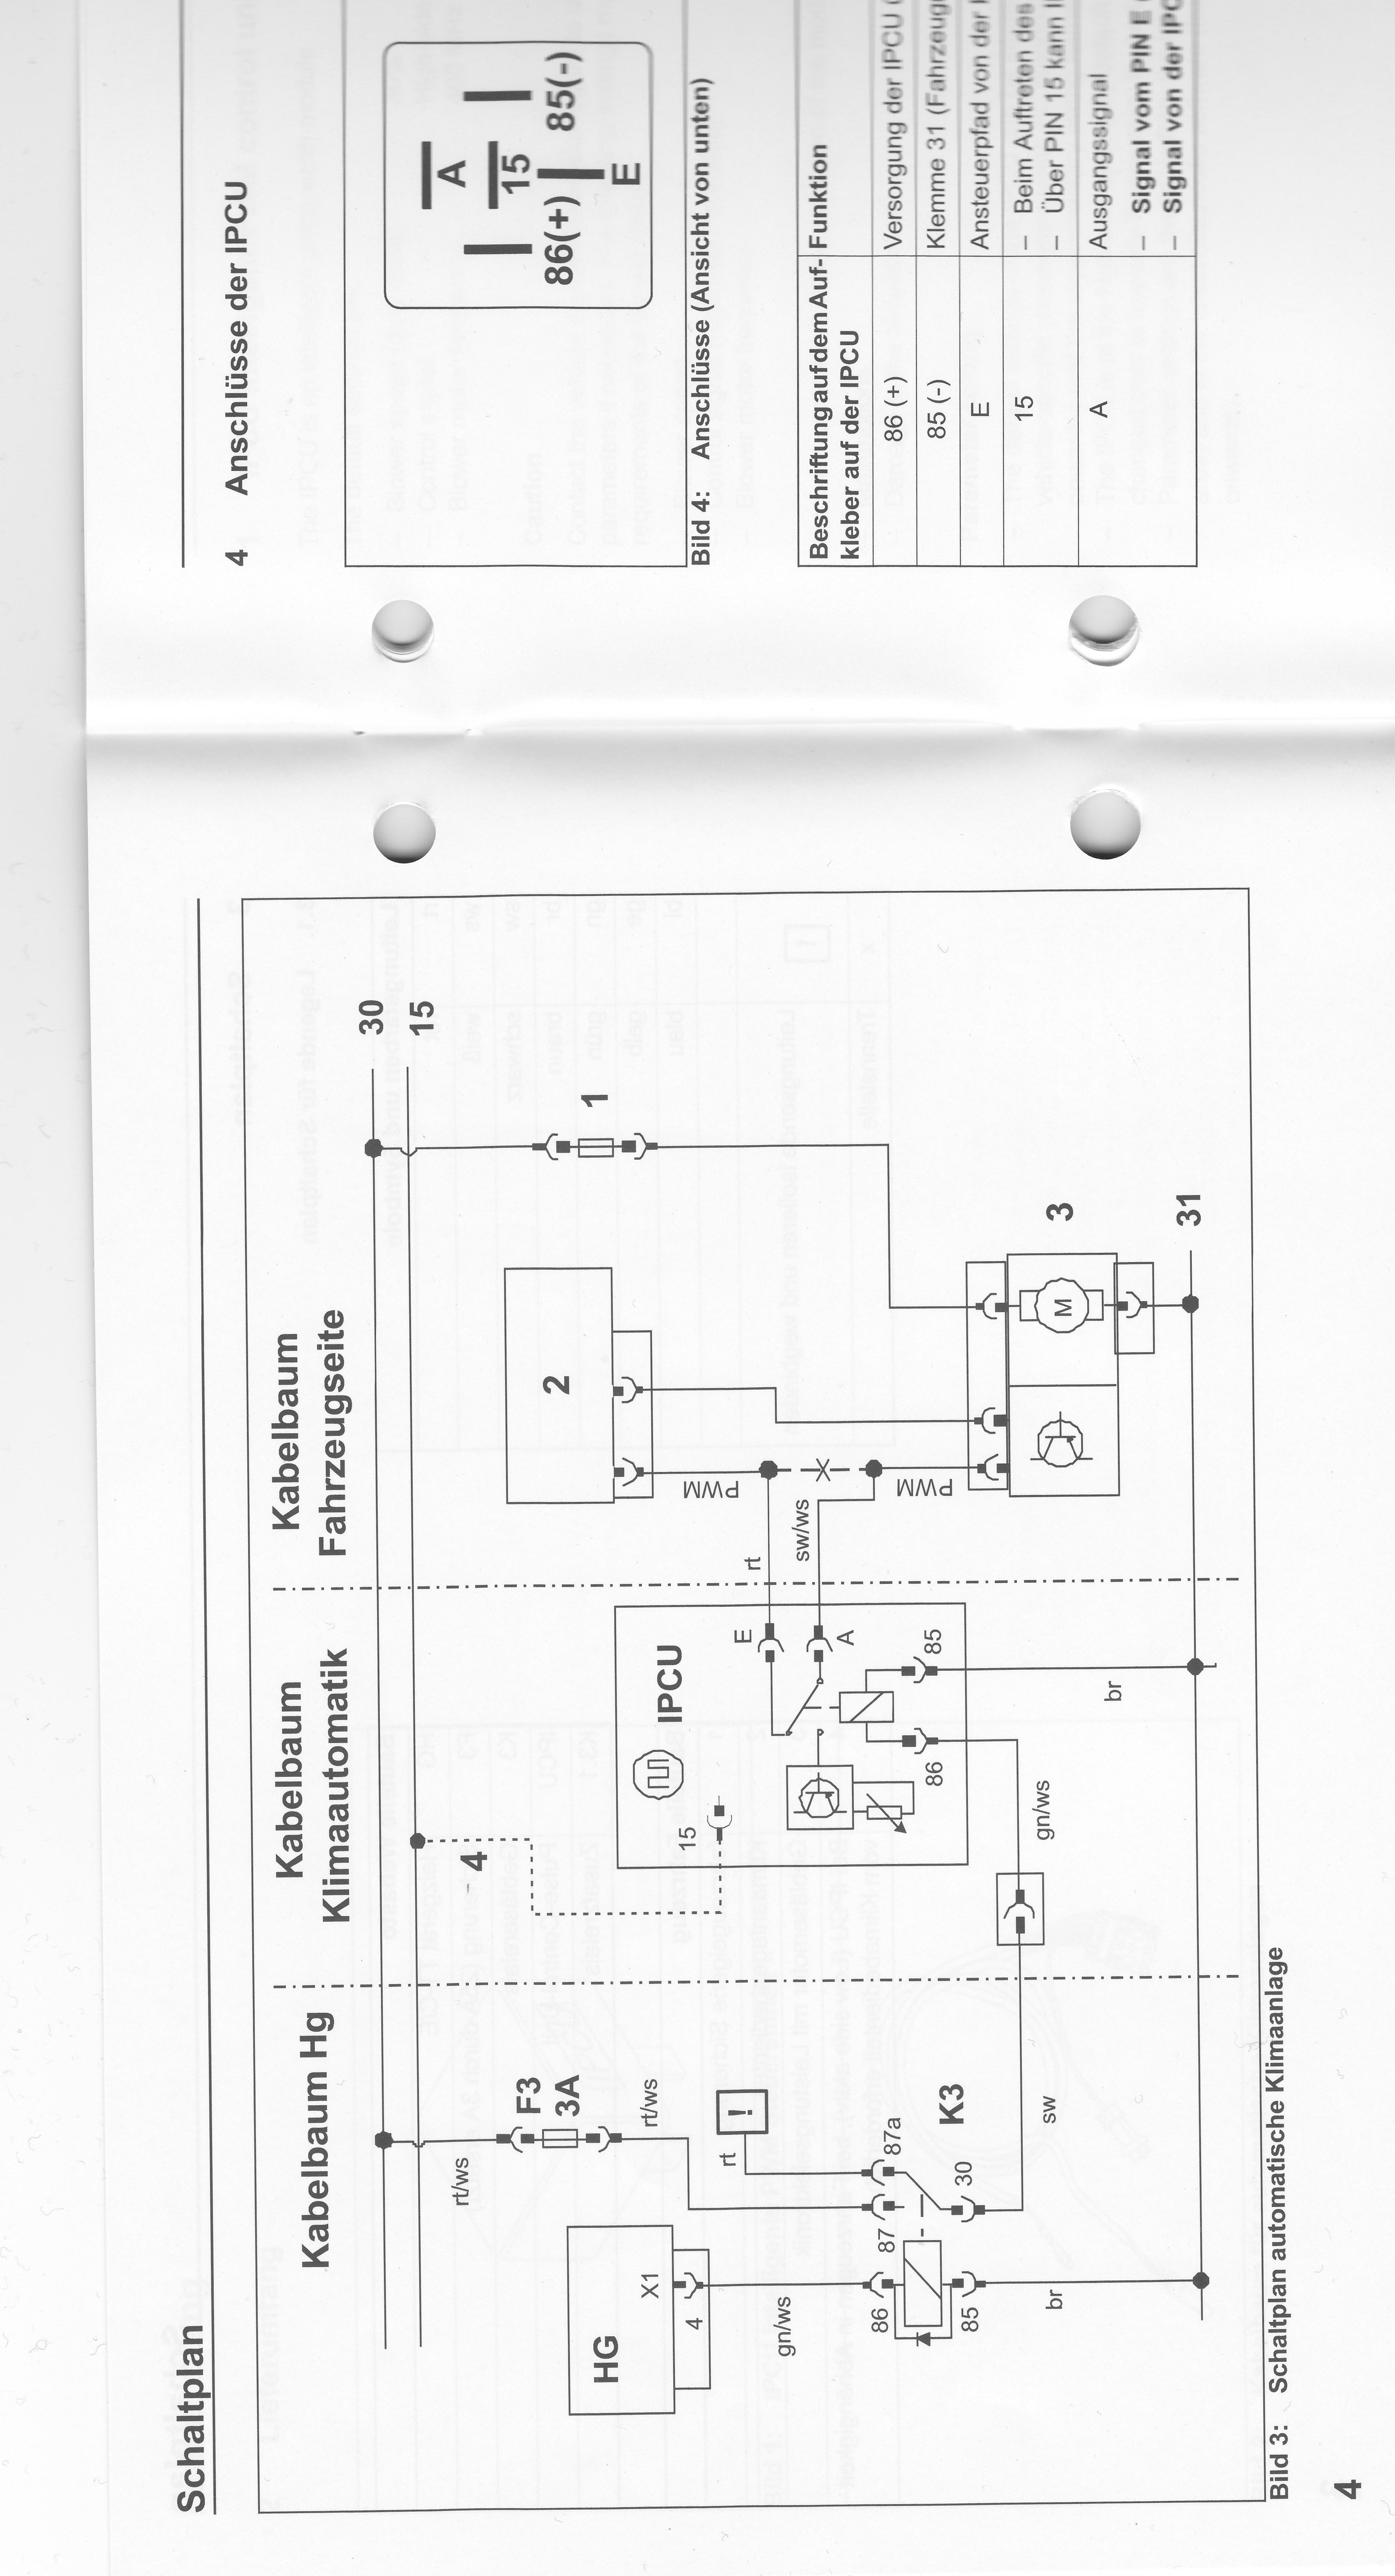 wie schlie e ich das ipcu modul richtig an. Black Bedroom Furniture Sets. Home Design Ideas